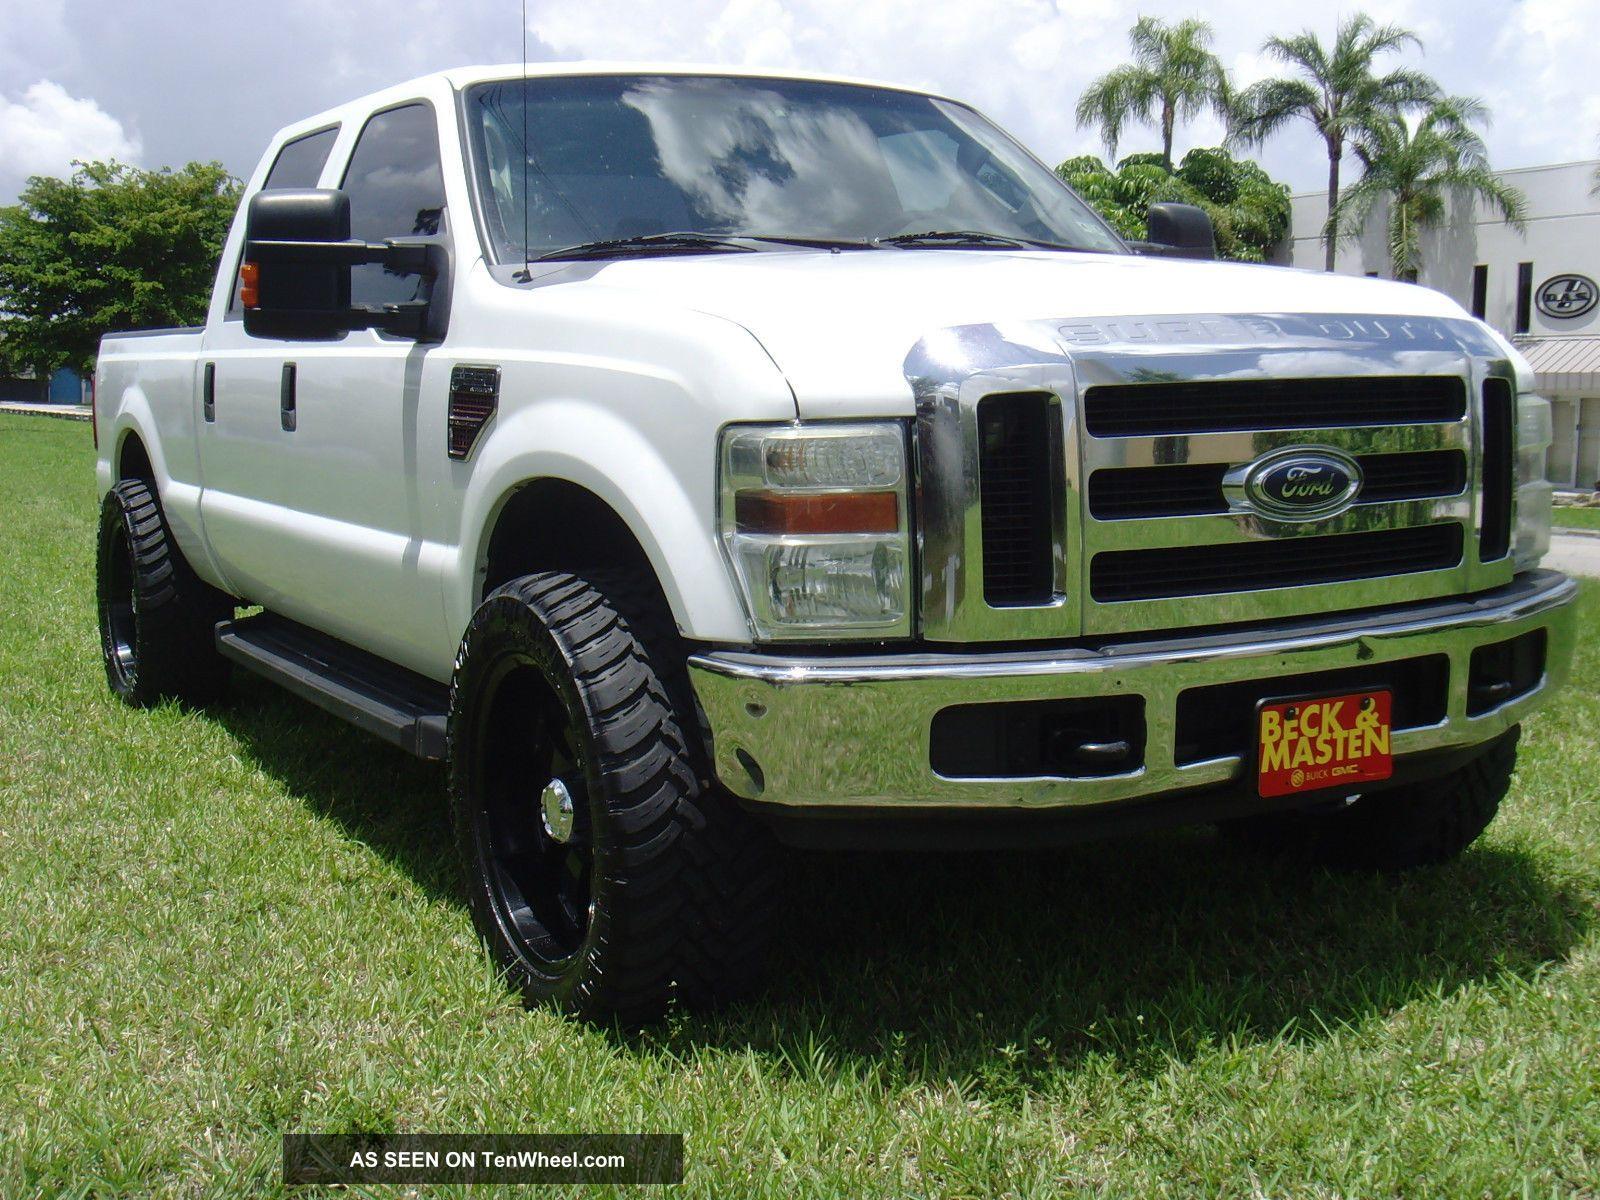 2008 ford f 250 lariat crew cab 4x4 diesel. Black Bedroom Furniture Sets. Home Design Ideas